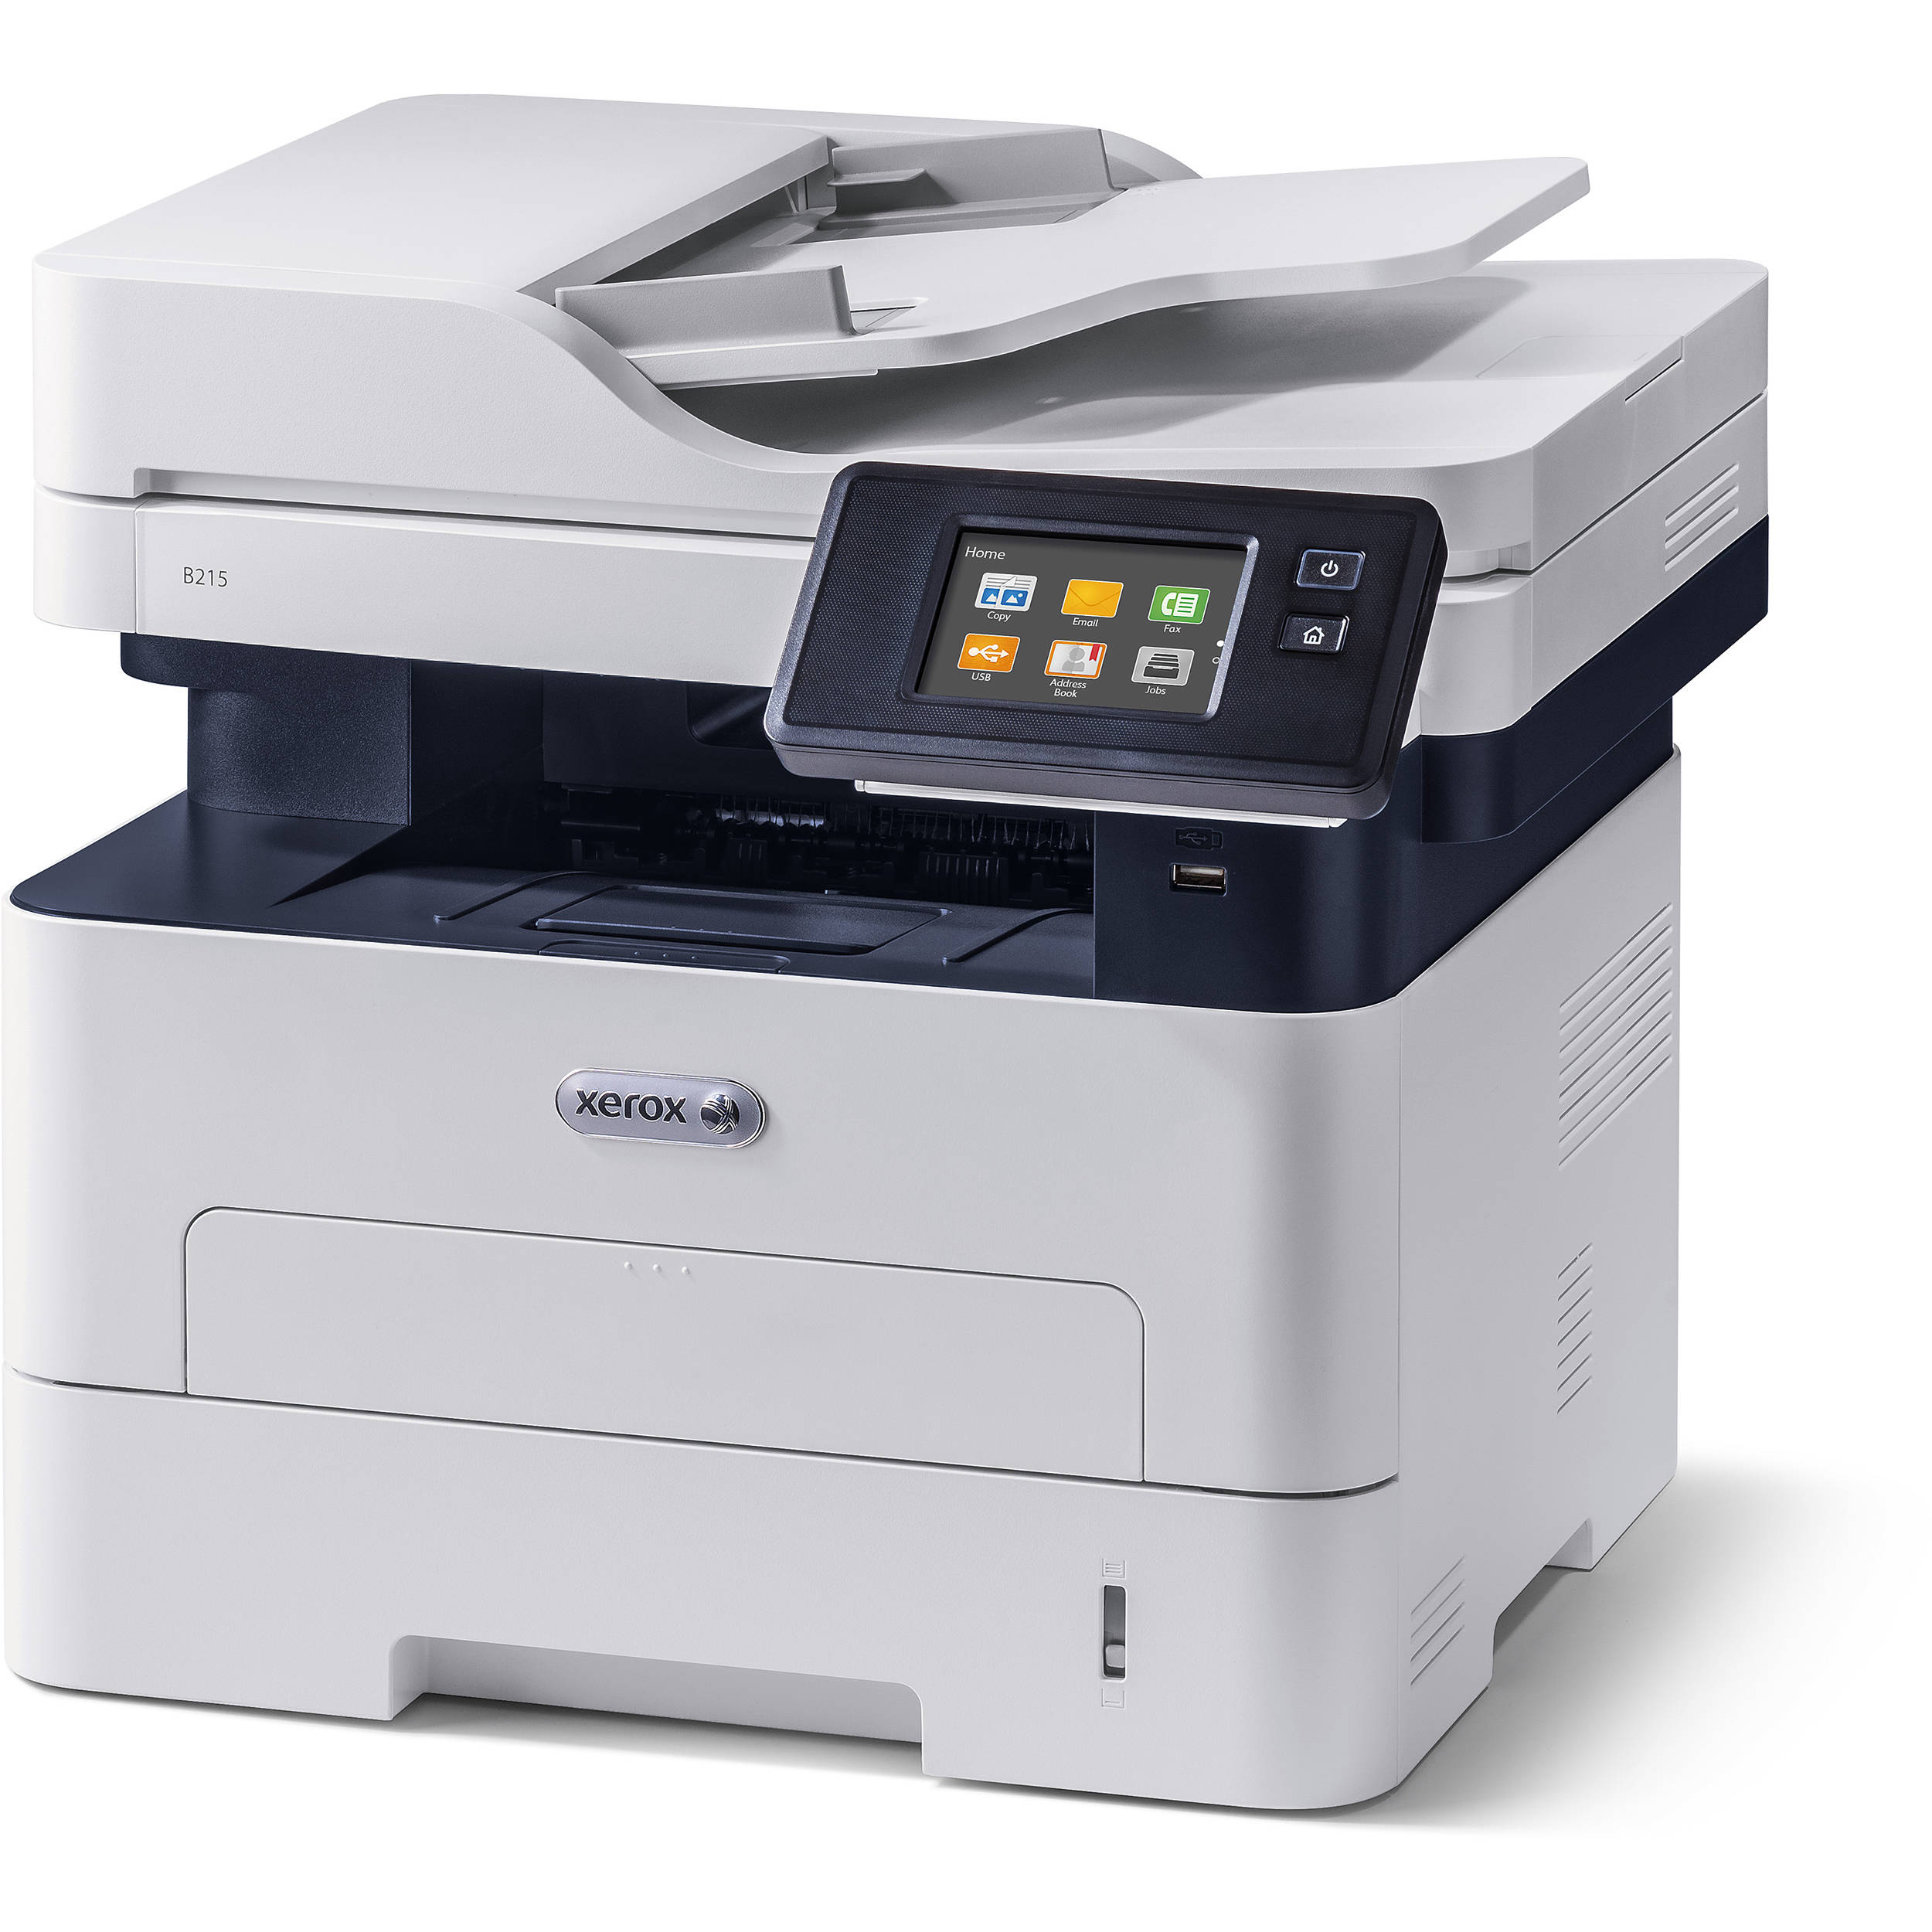 Used Xerox B215 Multifunction Monochrome Laser Printer B215 Dni